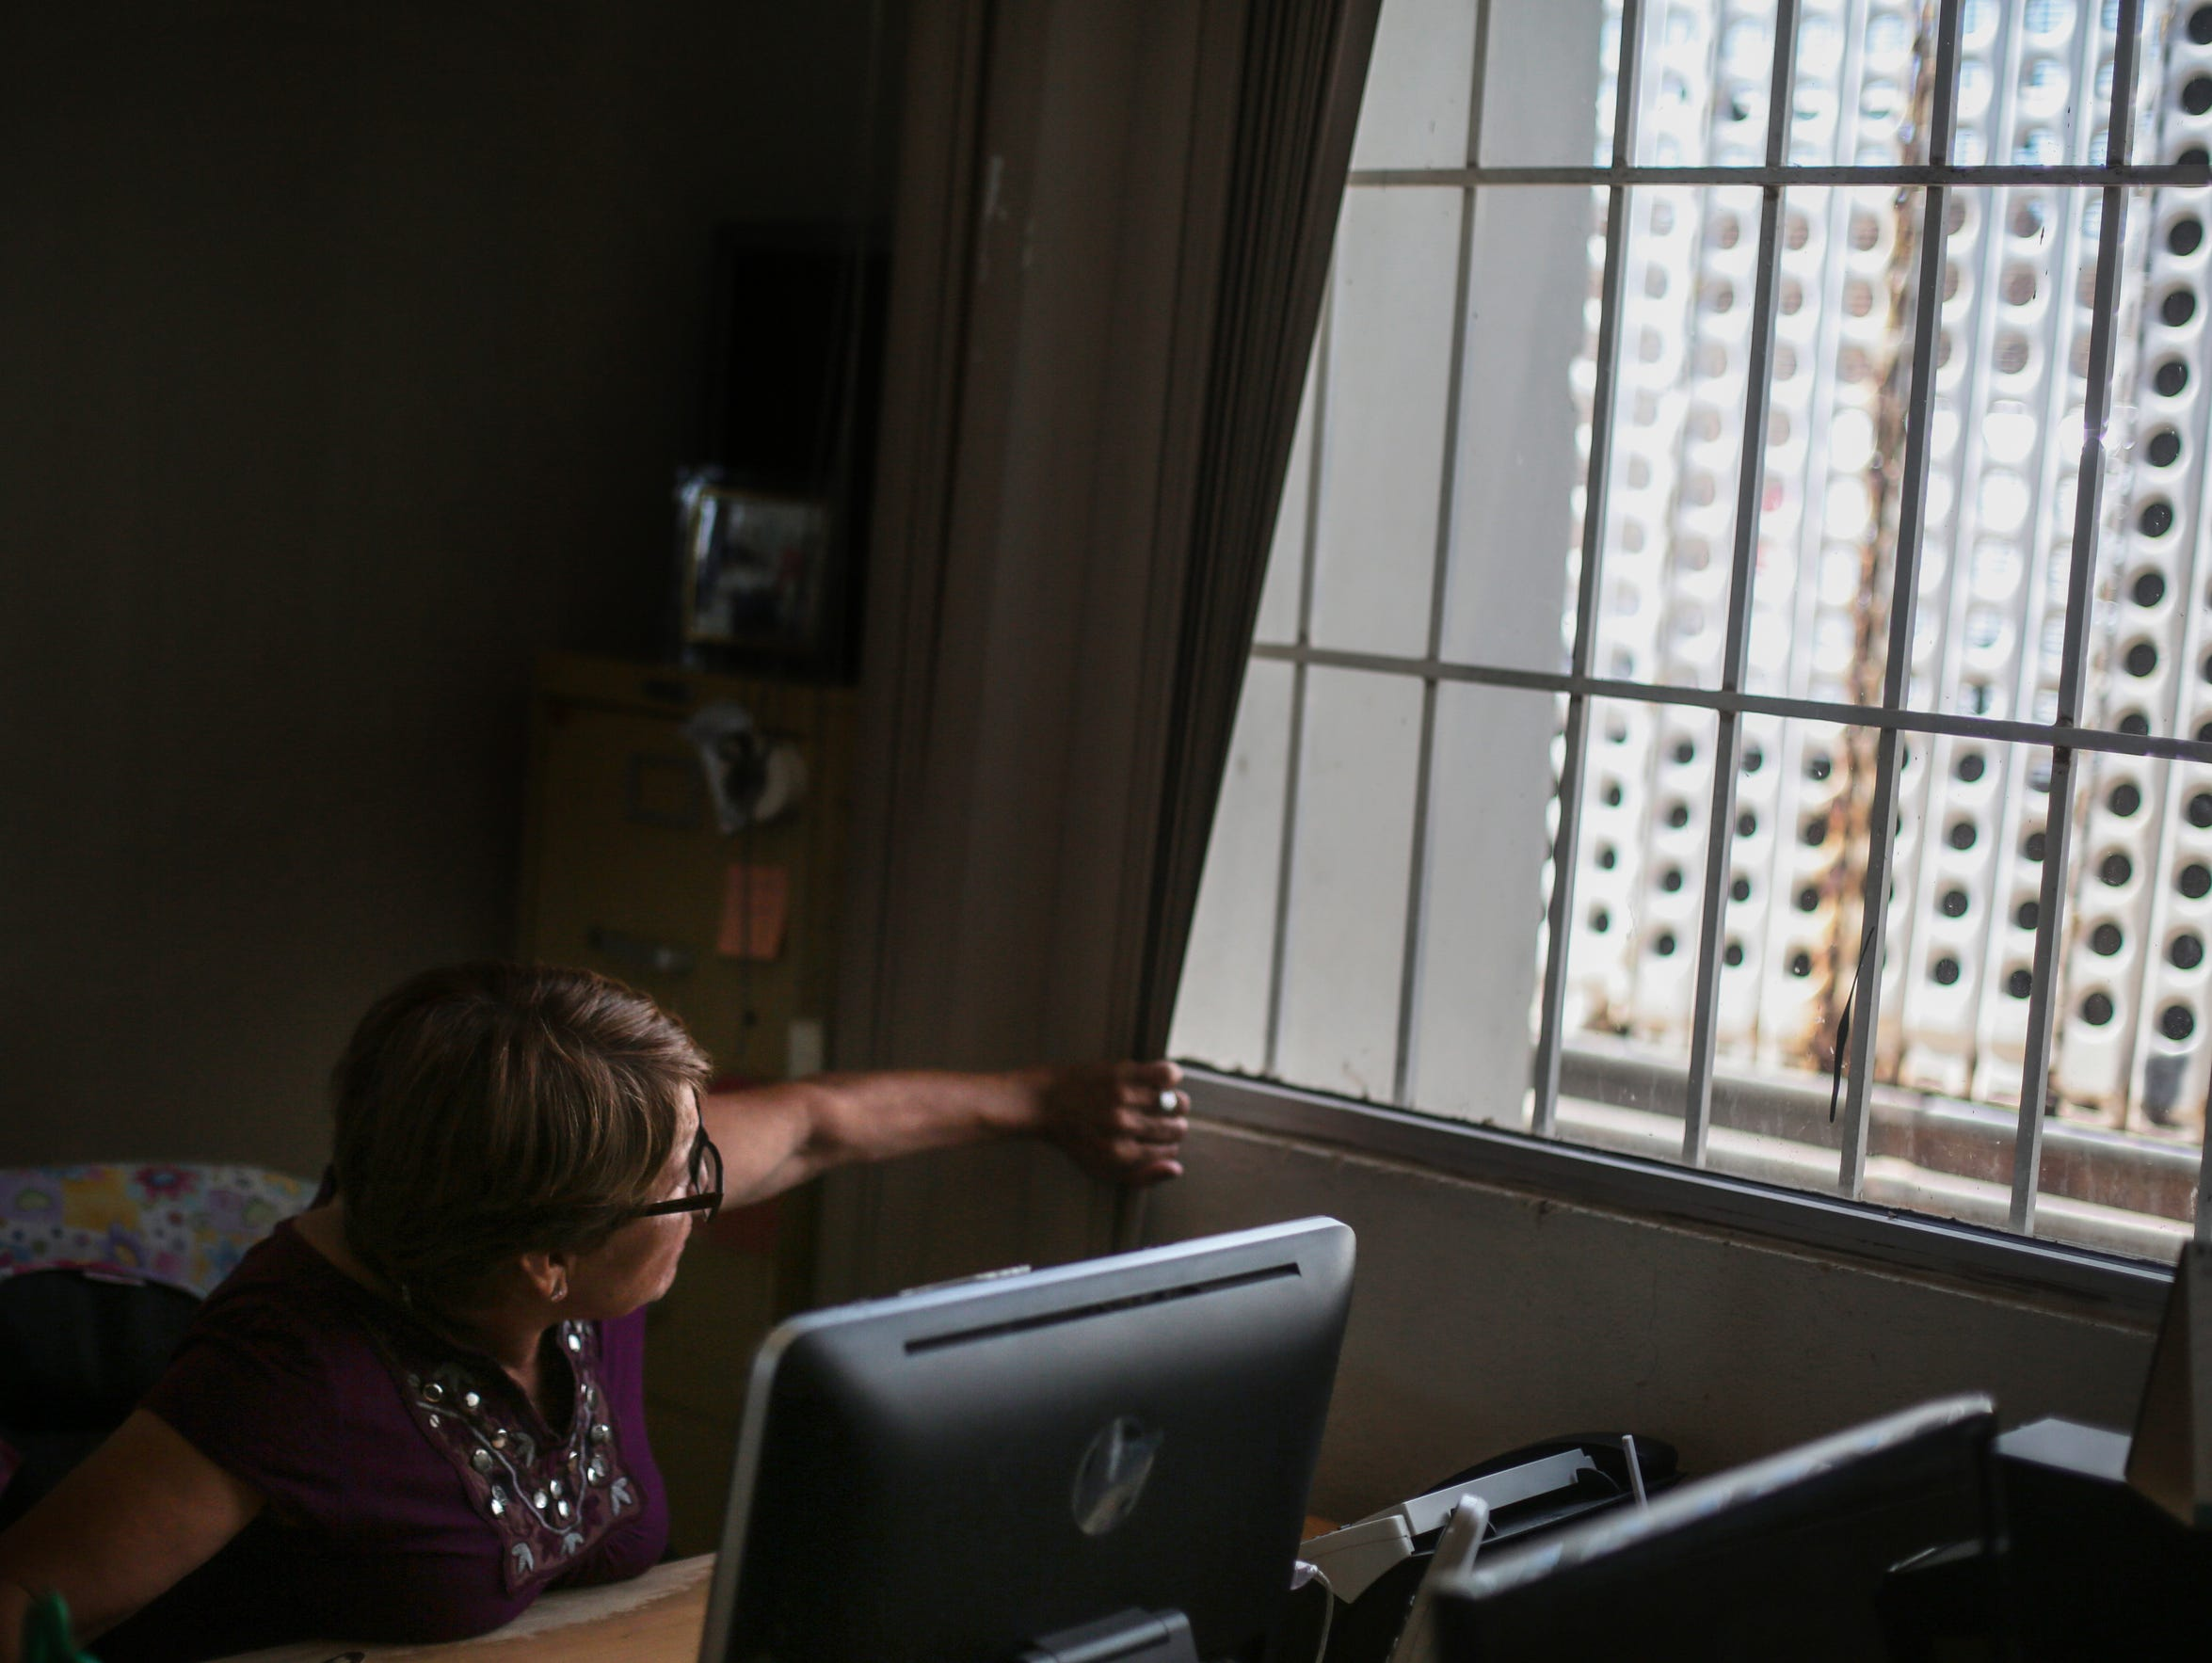 Yolanda Lopez, 67, a volunteer at a migrant care center